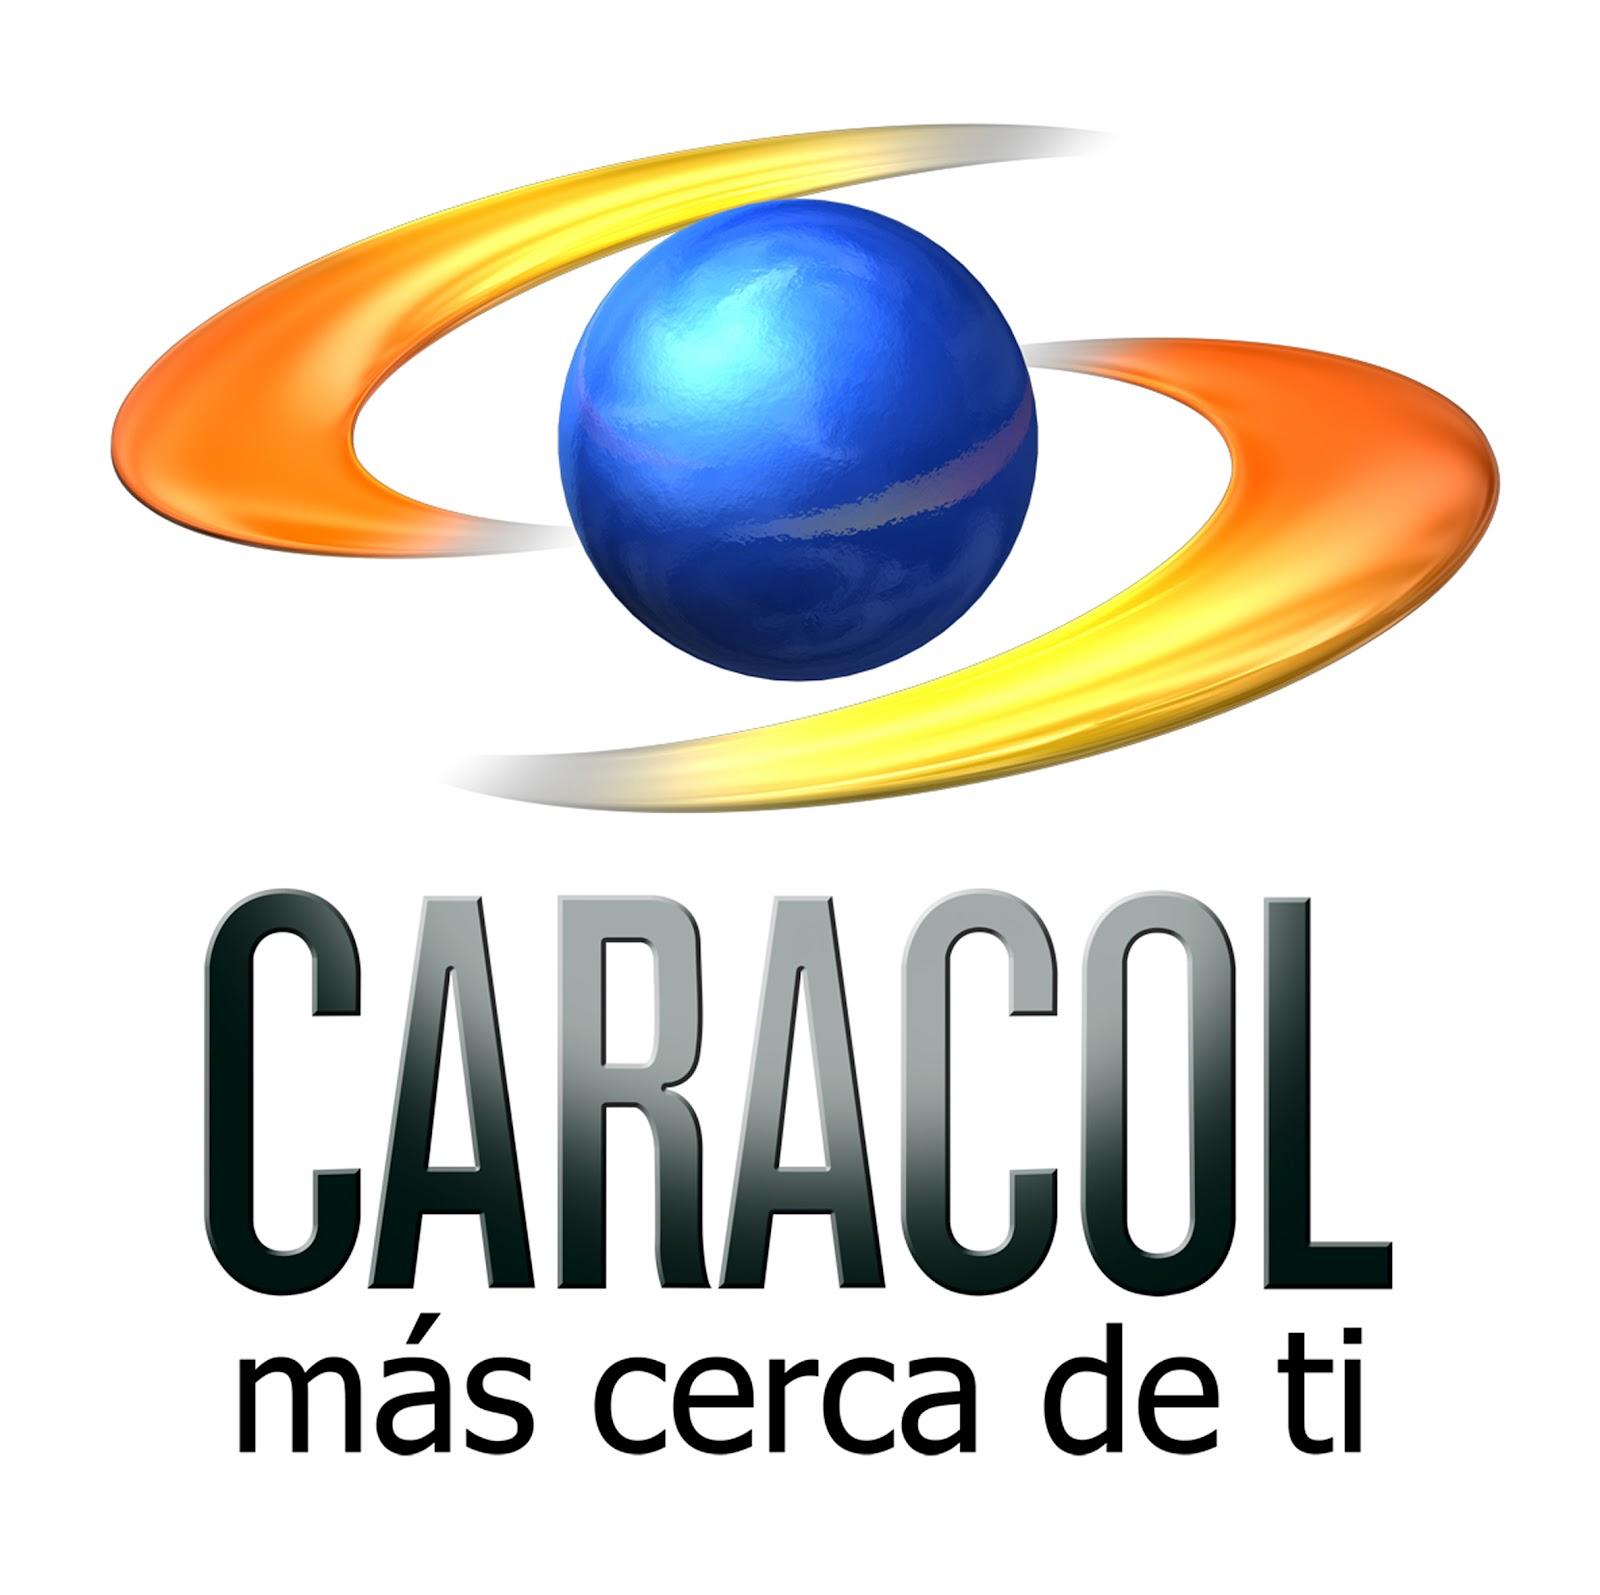 De juan valdez cafe colombia antigua ver caracol tv en vivo gratis